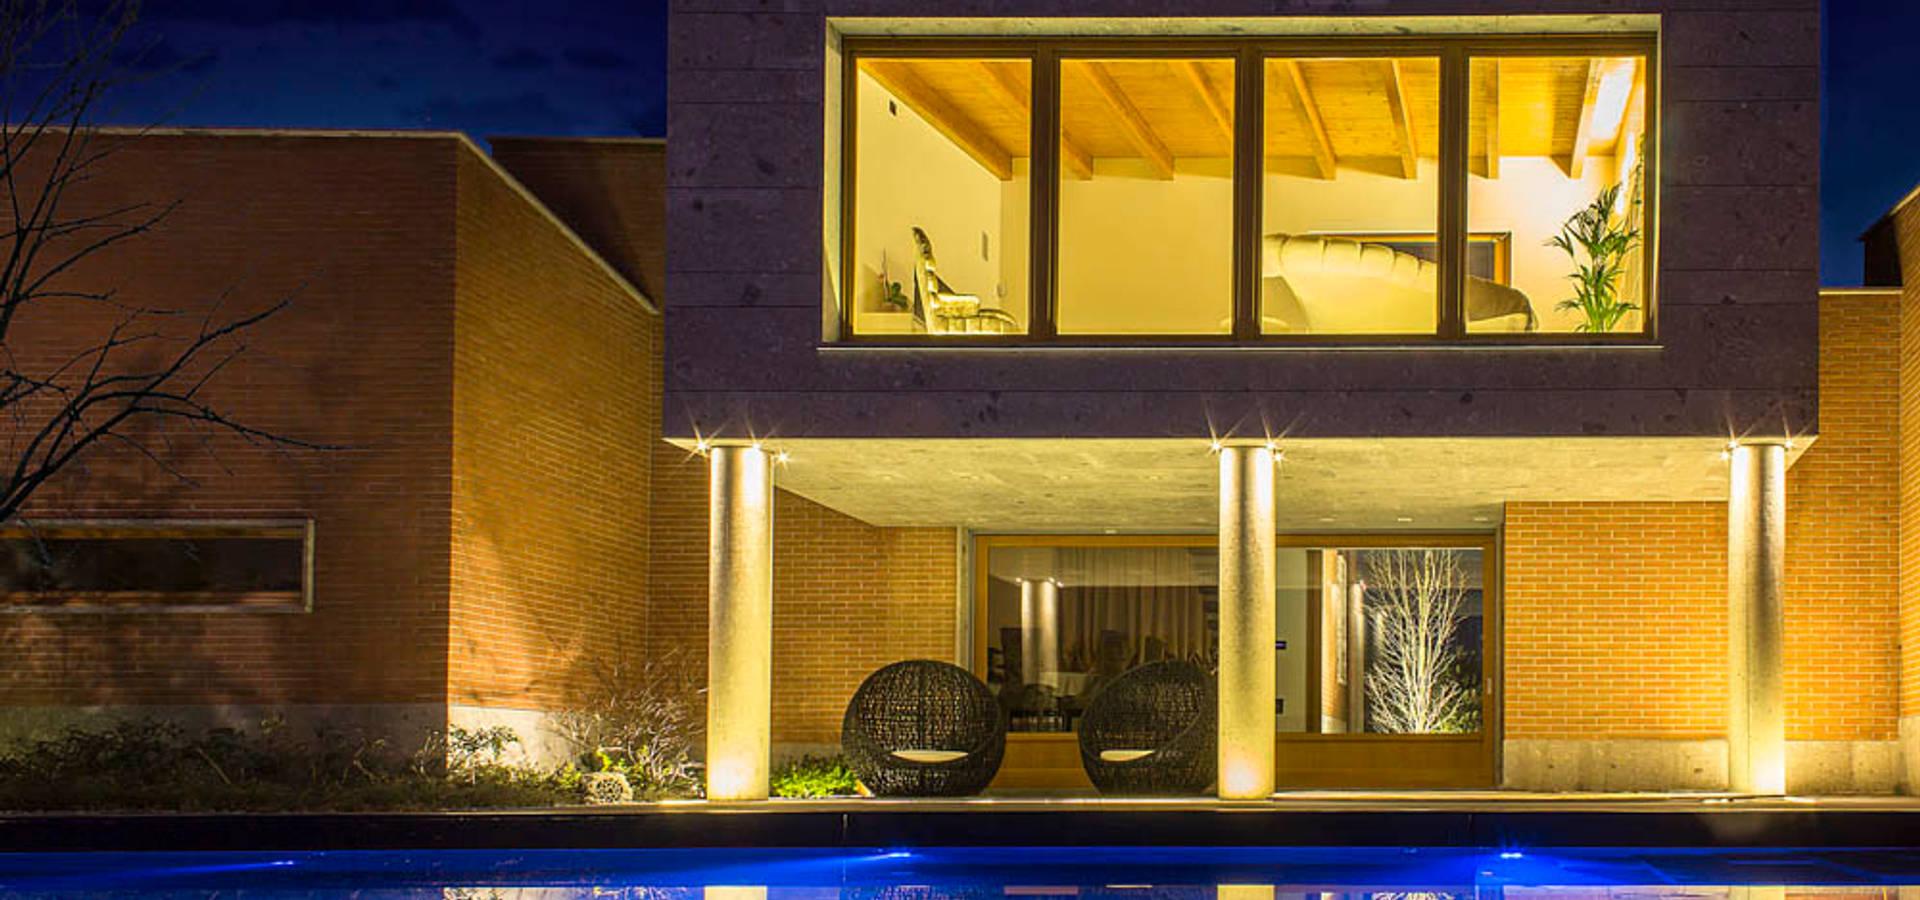 Matteo Gattoni—Architetto